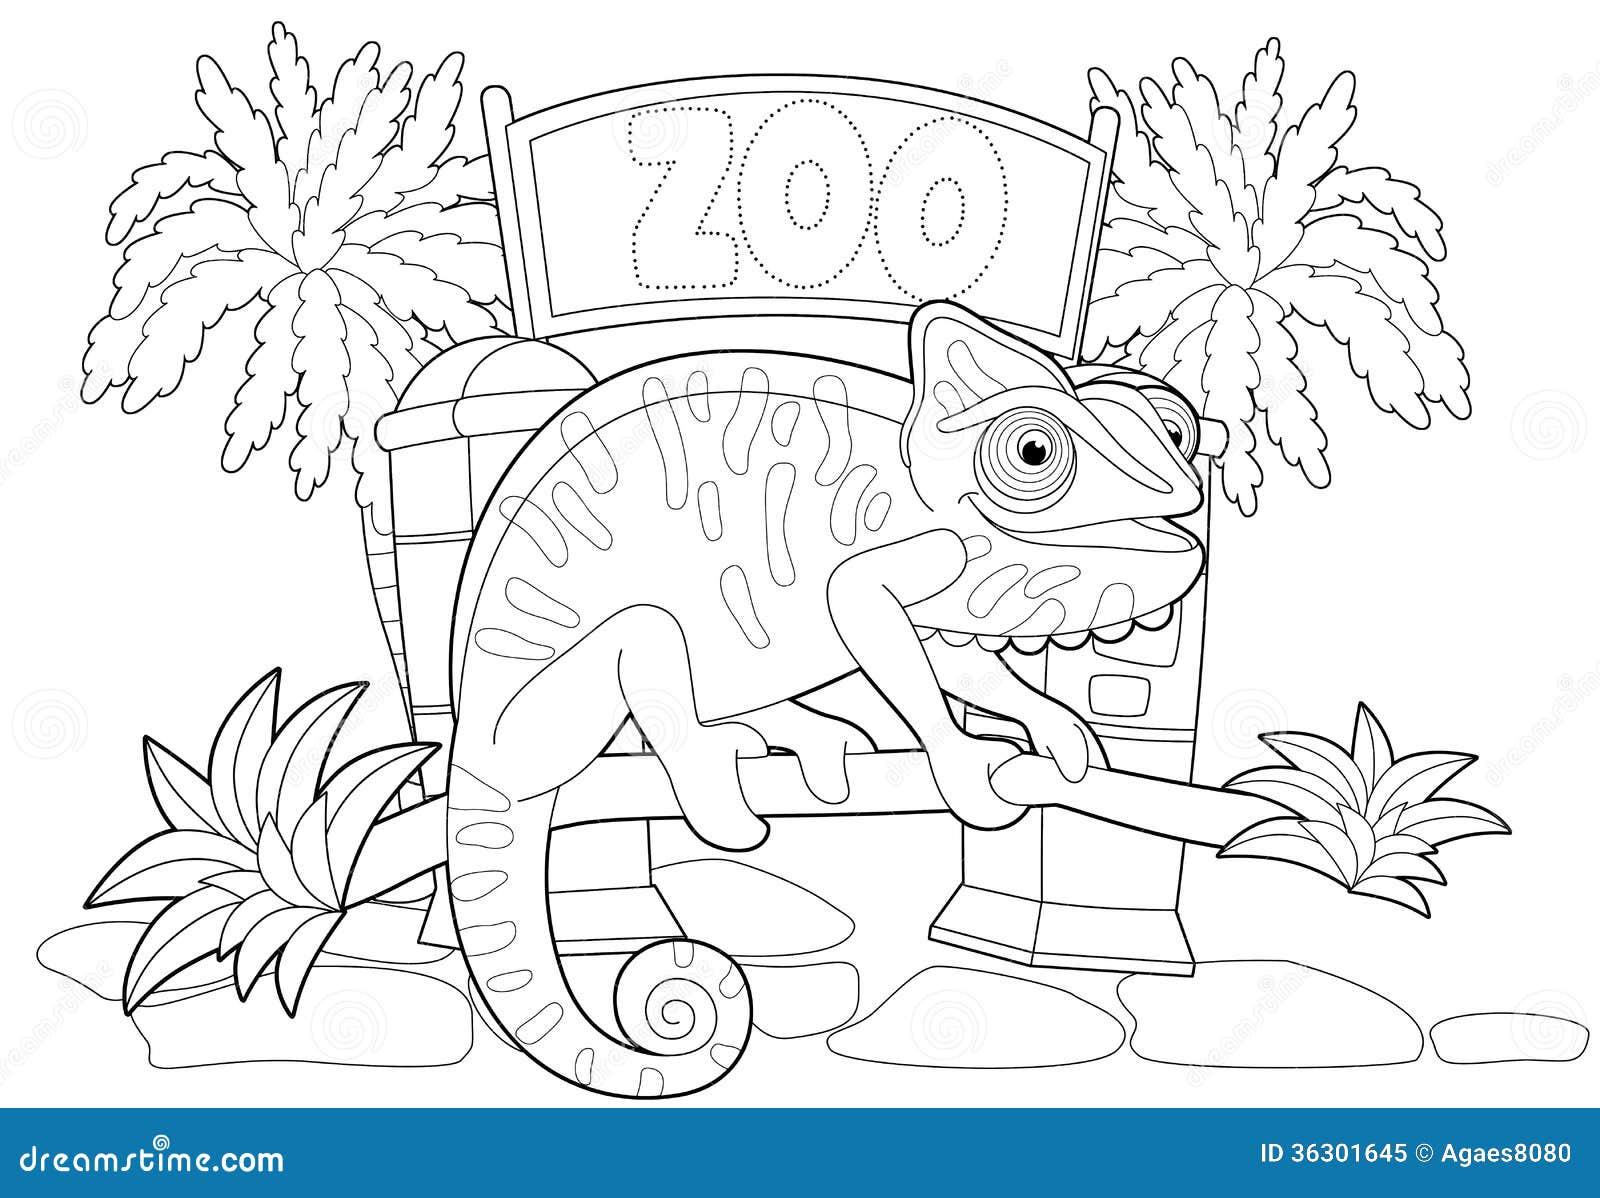 Desenho De Letra Z De Zoológico Para Colorir: Illustration For The Children